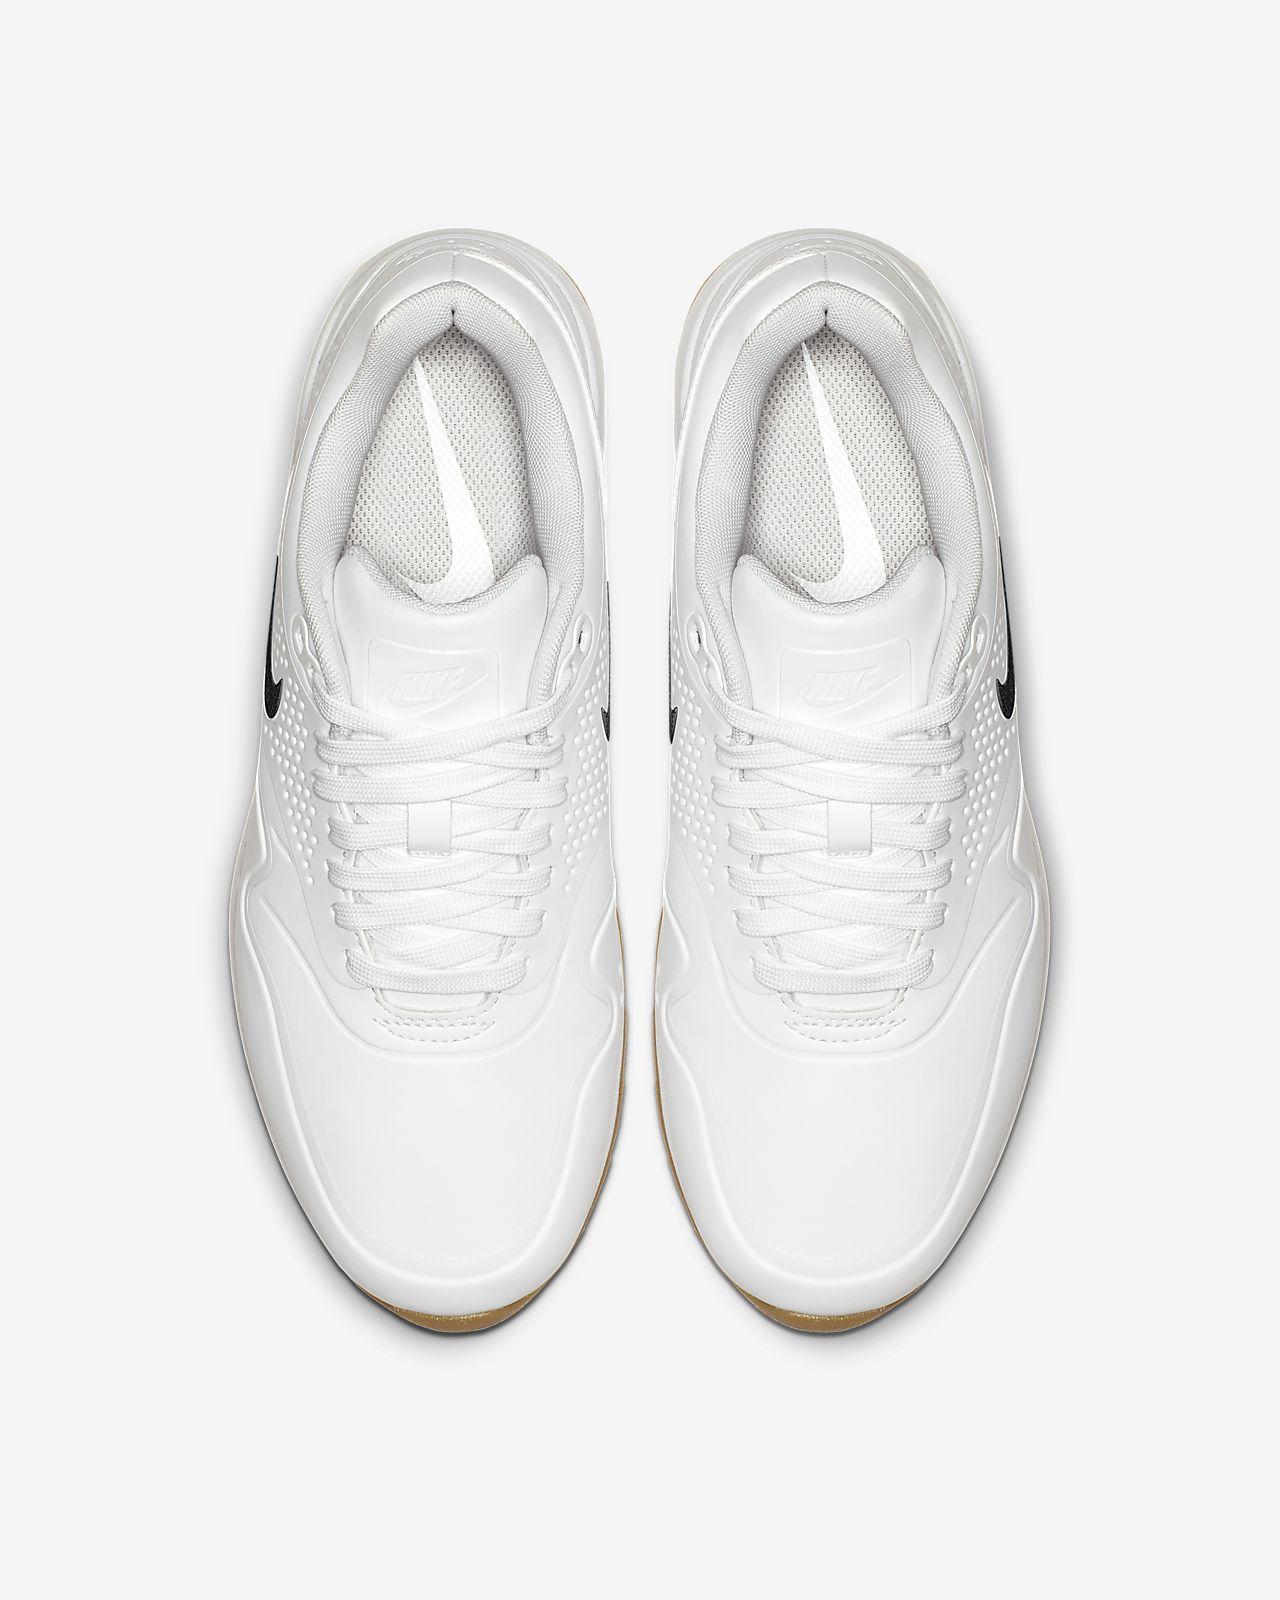 65a71755f256f Nike Air Max 1 G Womens Golf Shoe Nikecom Lu